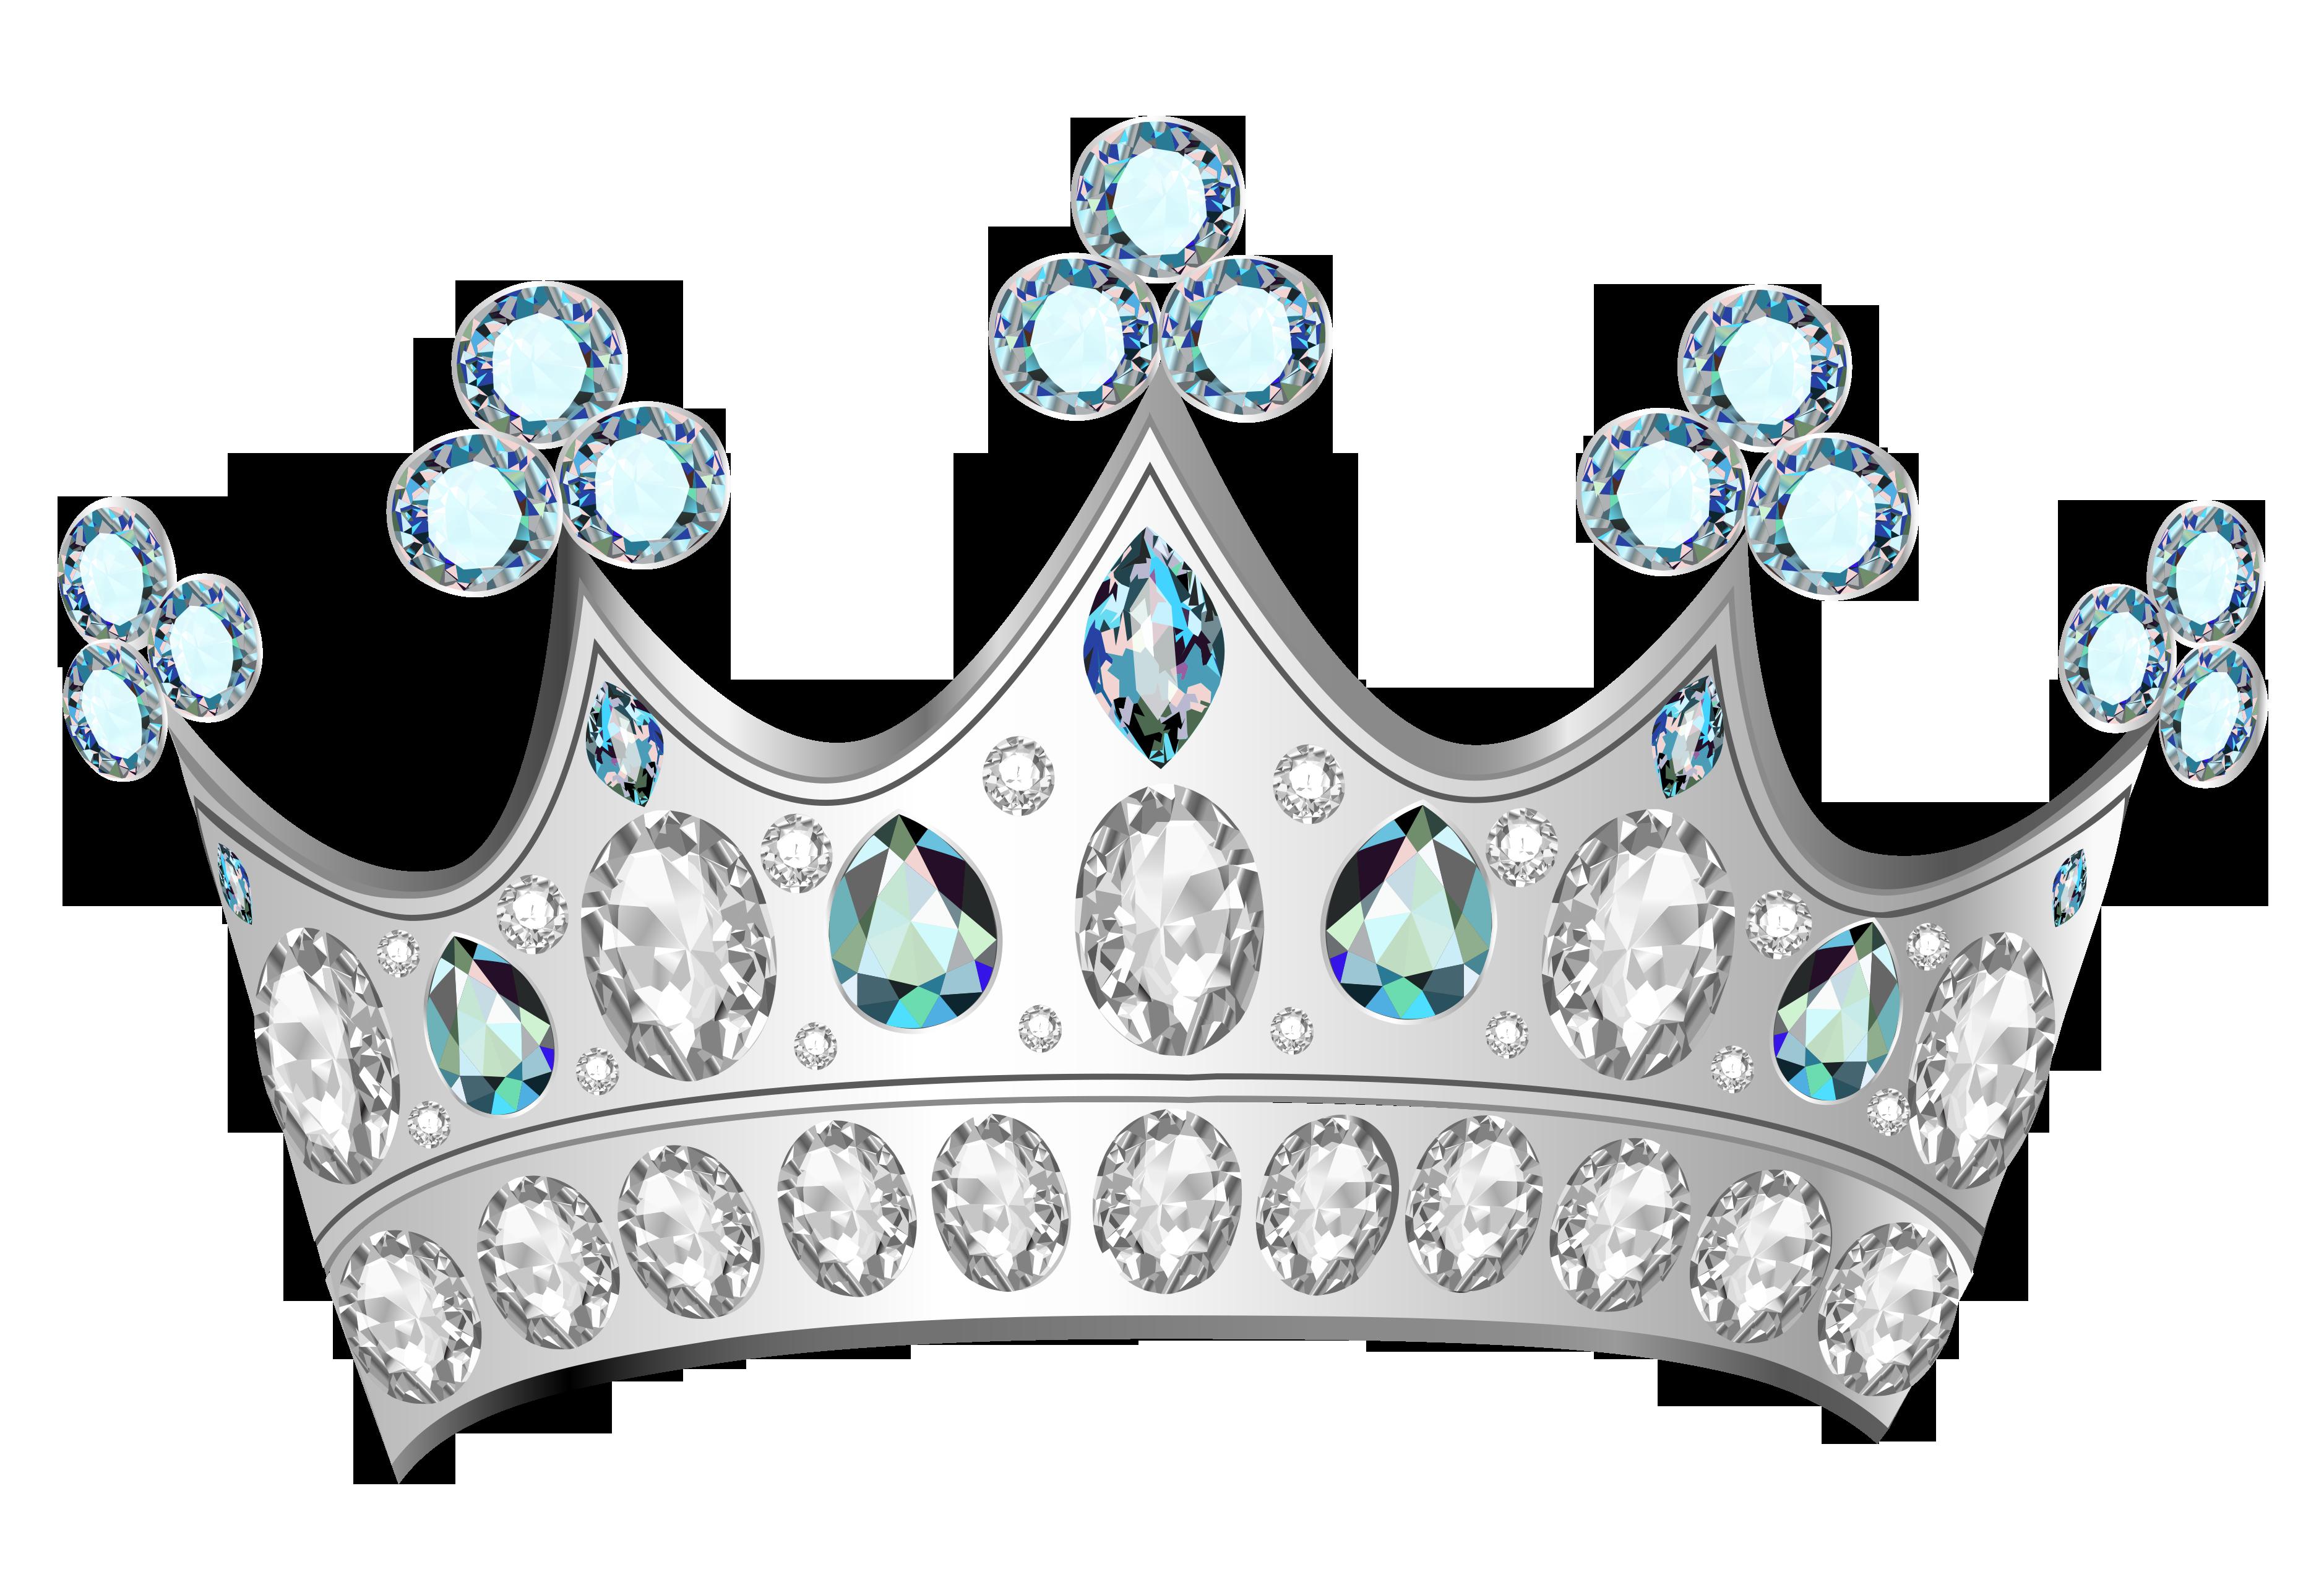 Crowns queen elizabeth crown